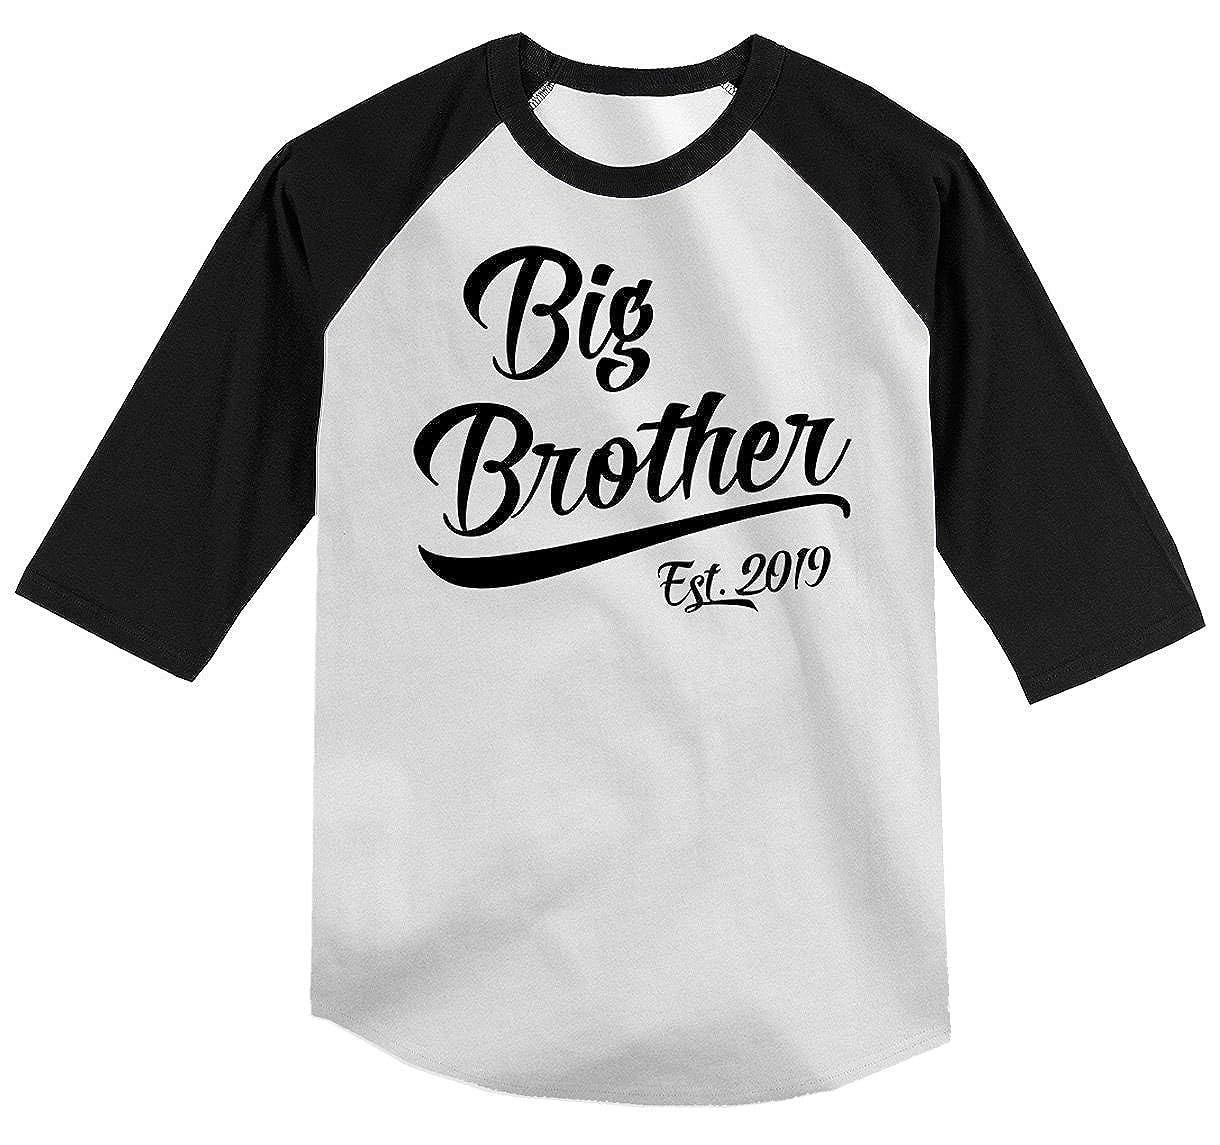 27cb7fb8 Amazon.com: Shirts By Sarah Boy's Toddler Big Brother EST. 2019 T-Shirt  Promoted to T-Shirt 3/4 Sleeve Raglan: Clothing